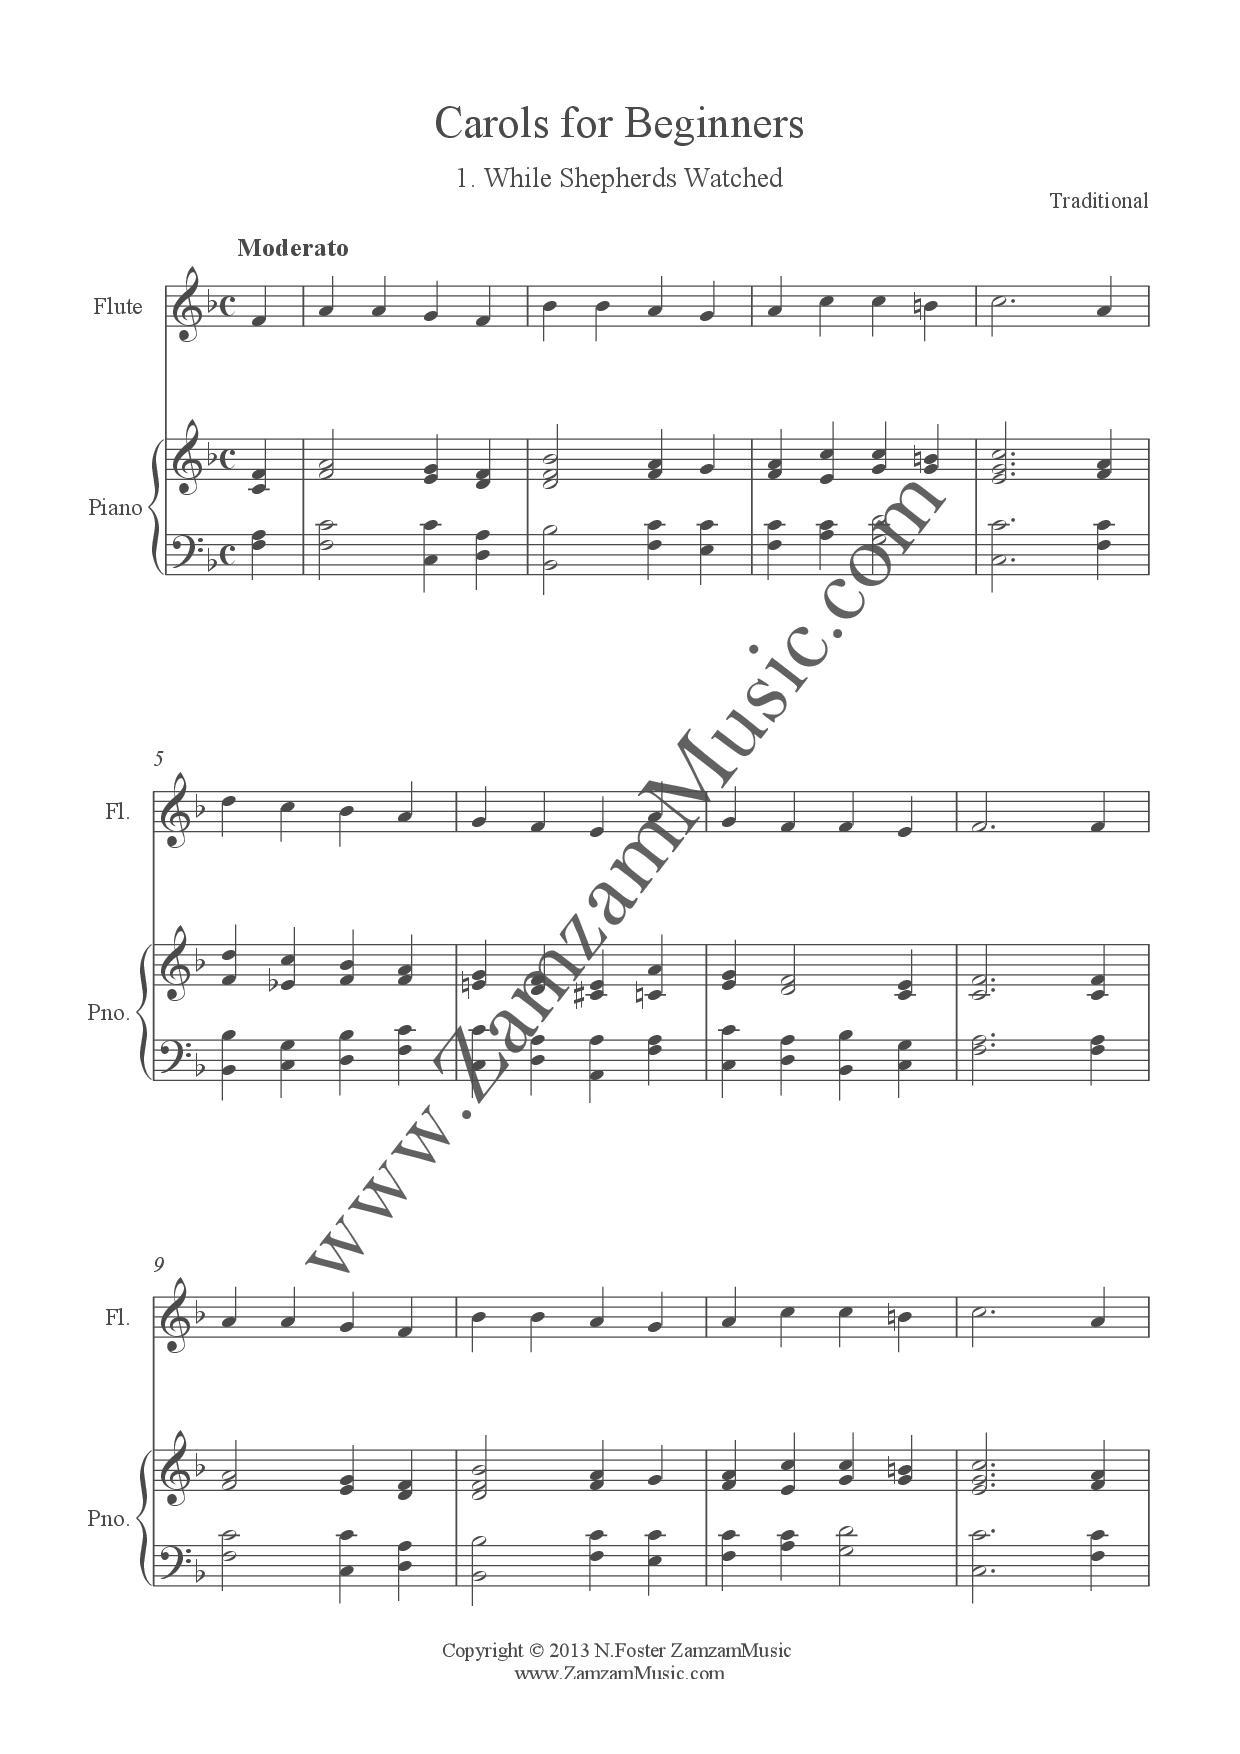 12 Christmas Carols For Beginner Level Flute And Piano Zamzam Music